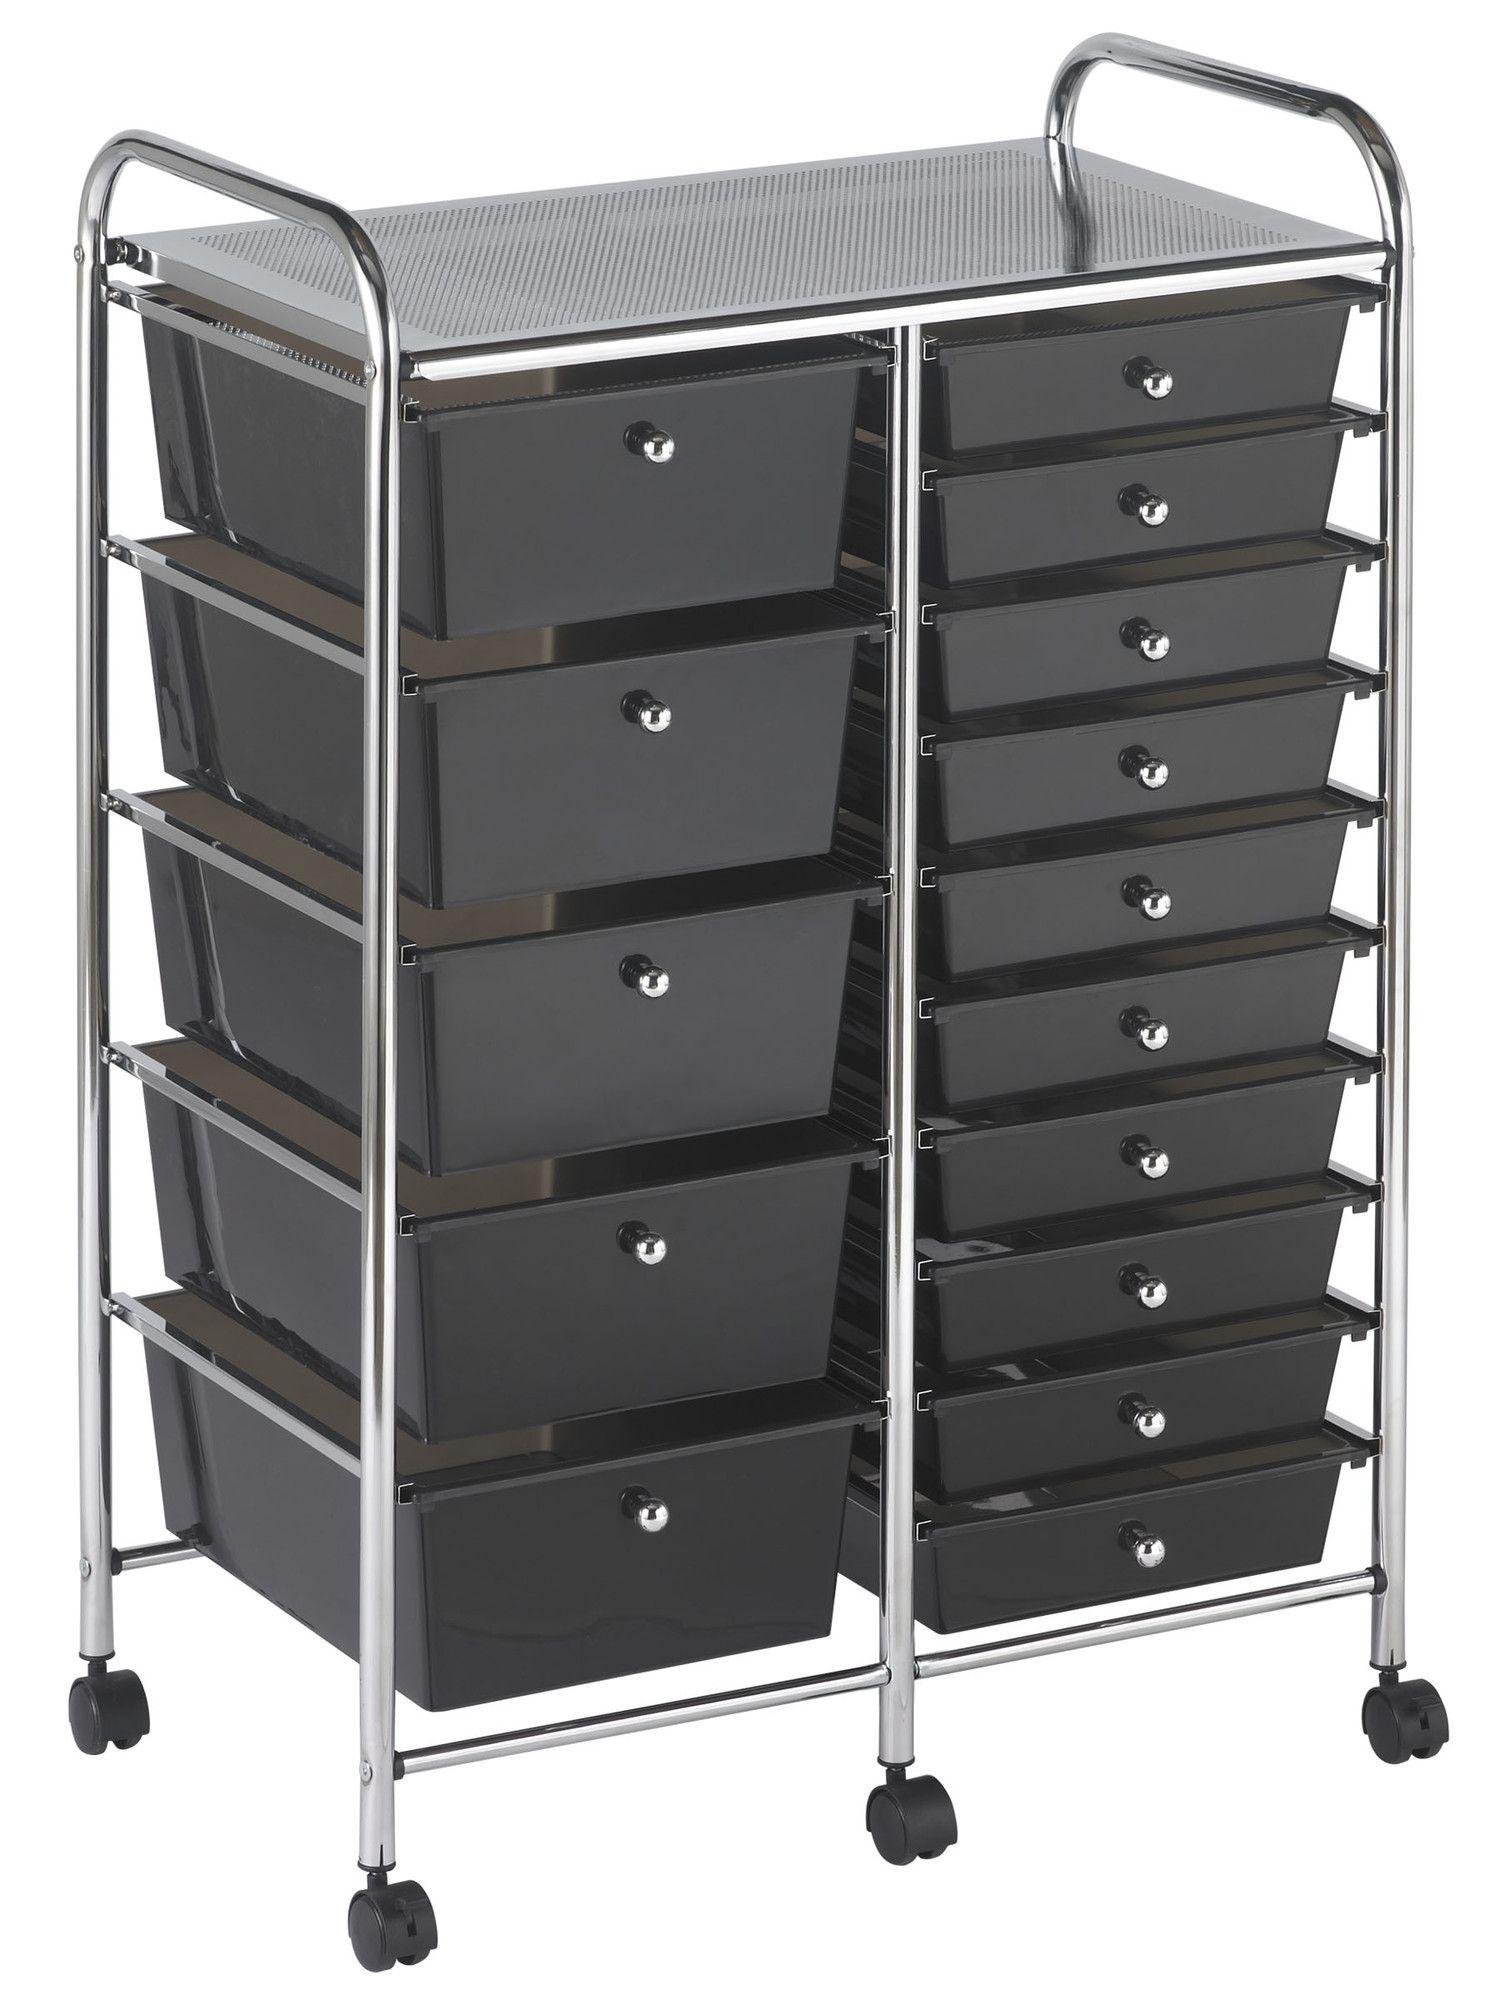 15 Drawer Storage Chest Storage Drawers Storage Plastic Drawers